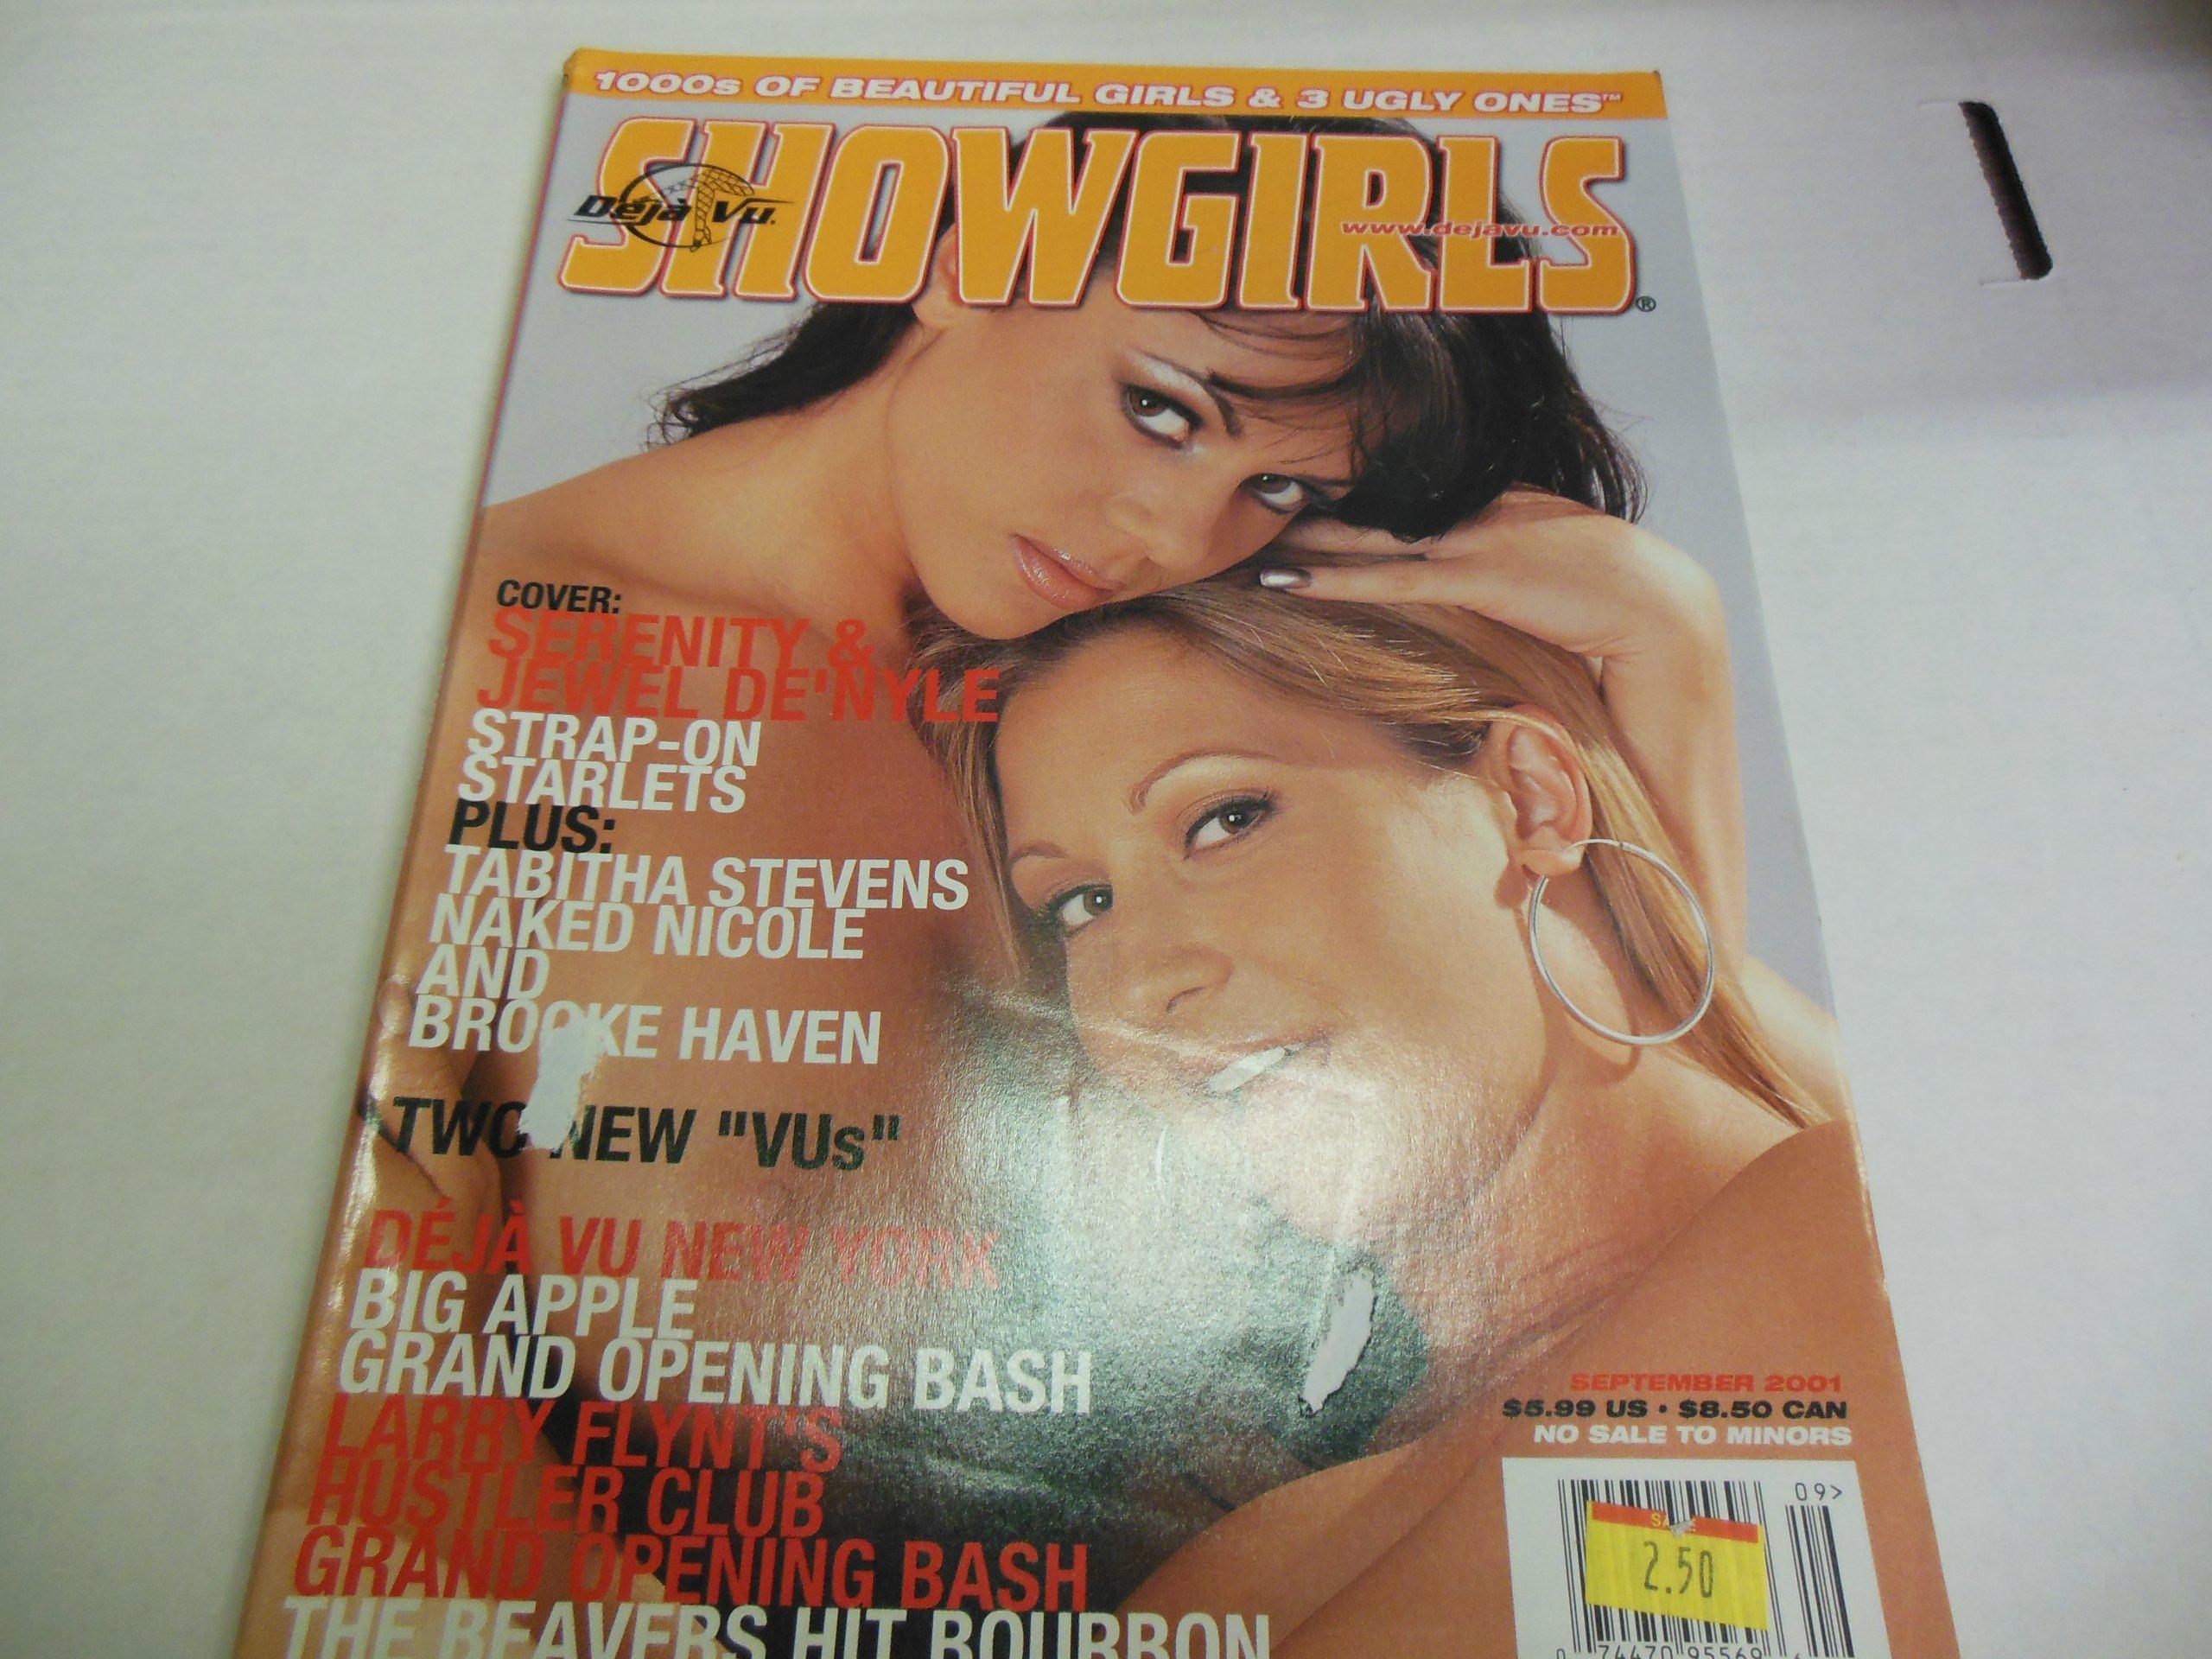 Deja Vu Showgirls Adult Magazine Serenity Jewel Denyle Tabitha Stevens September 2001 Show Girls Amazon Com Books